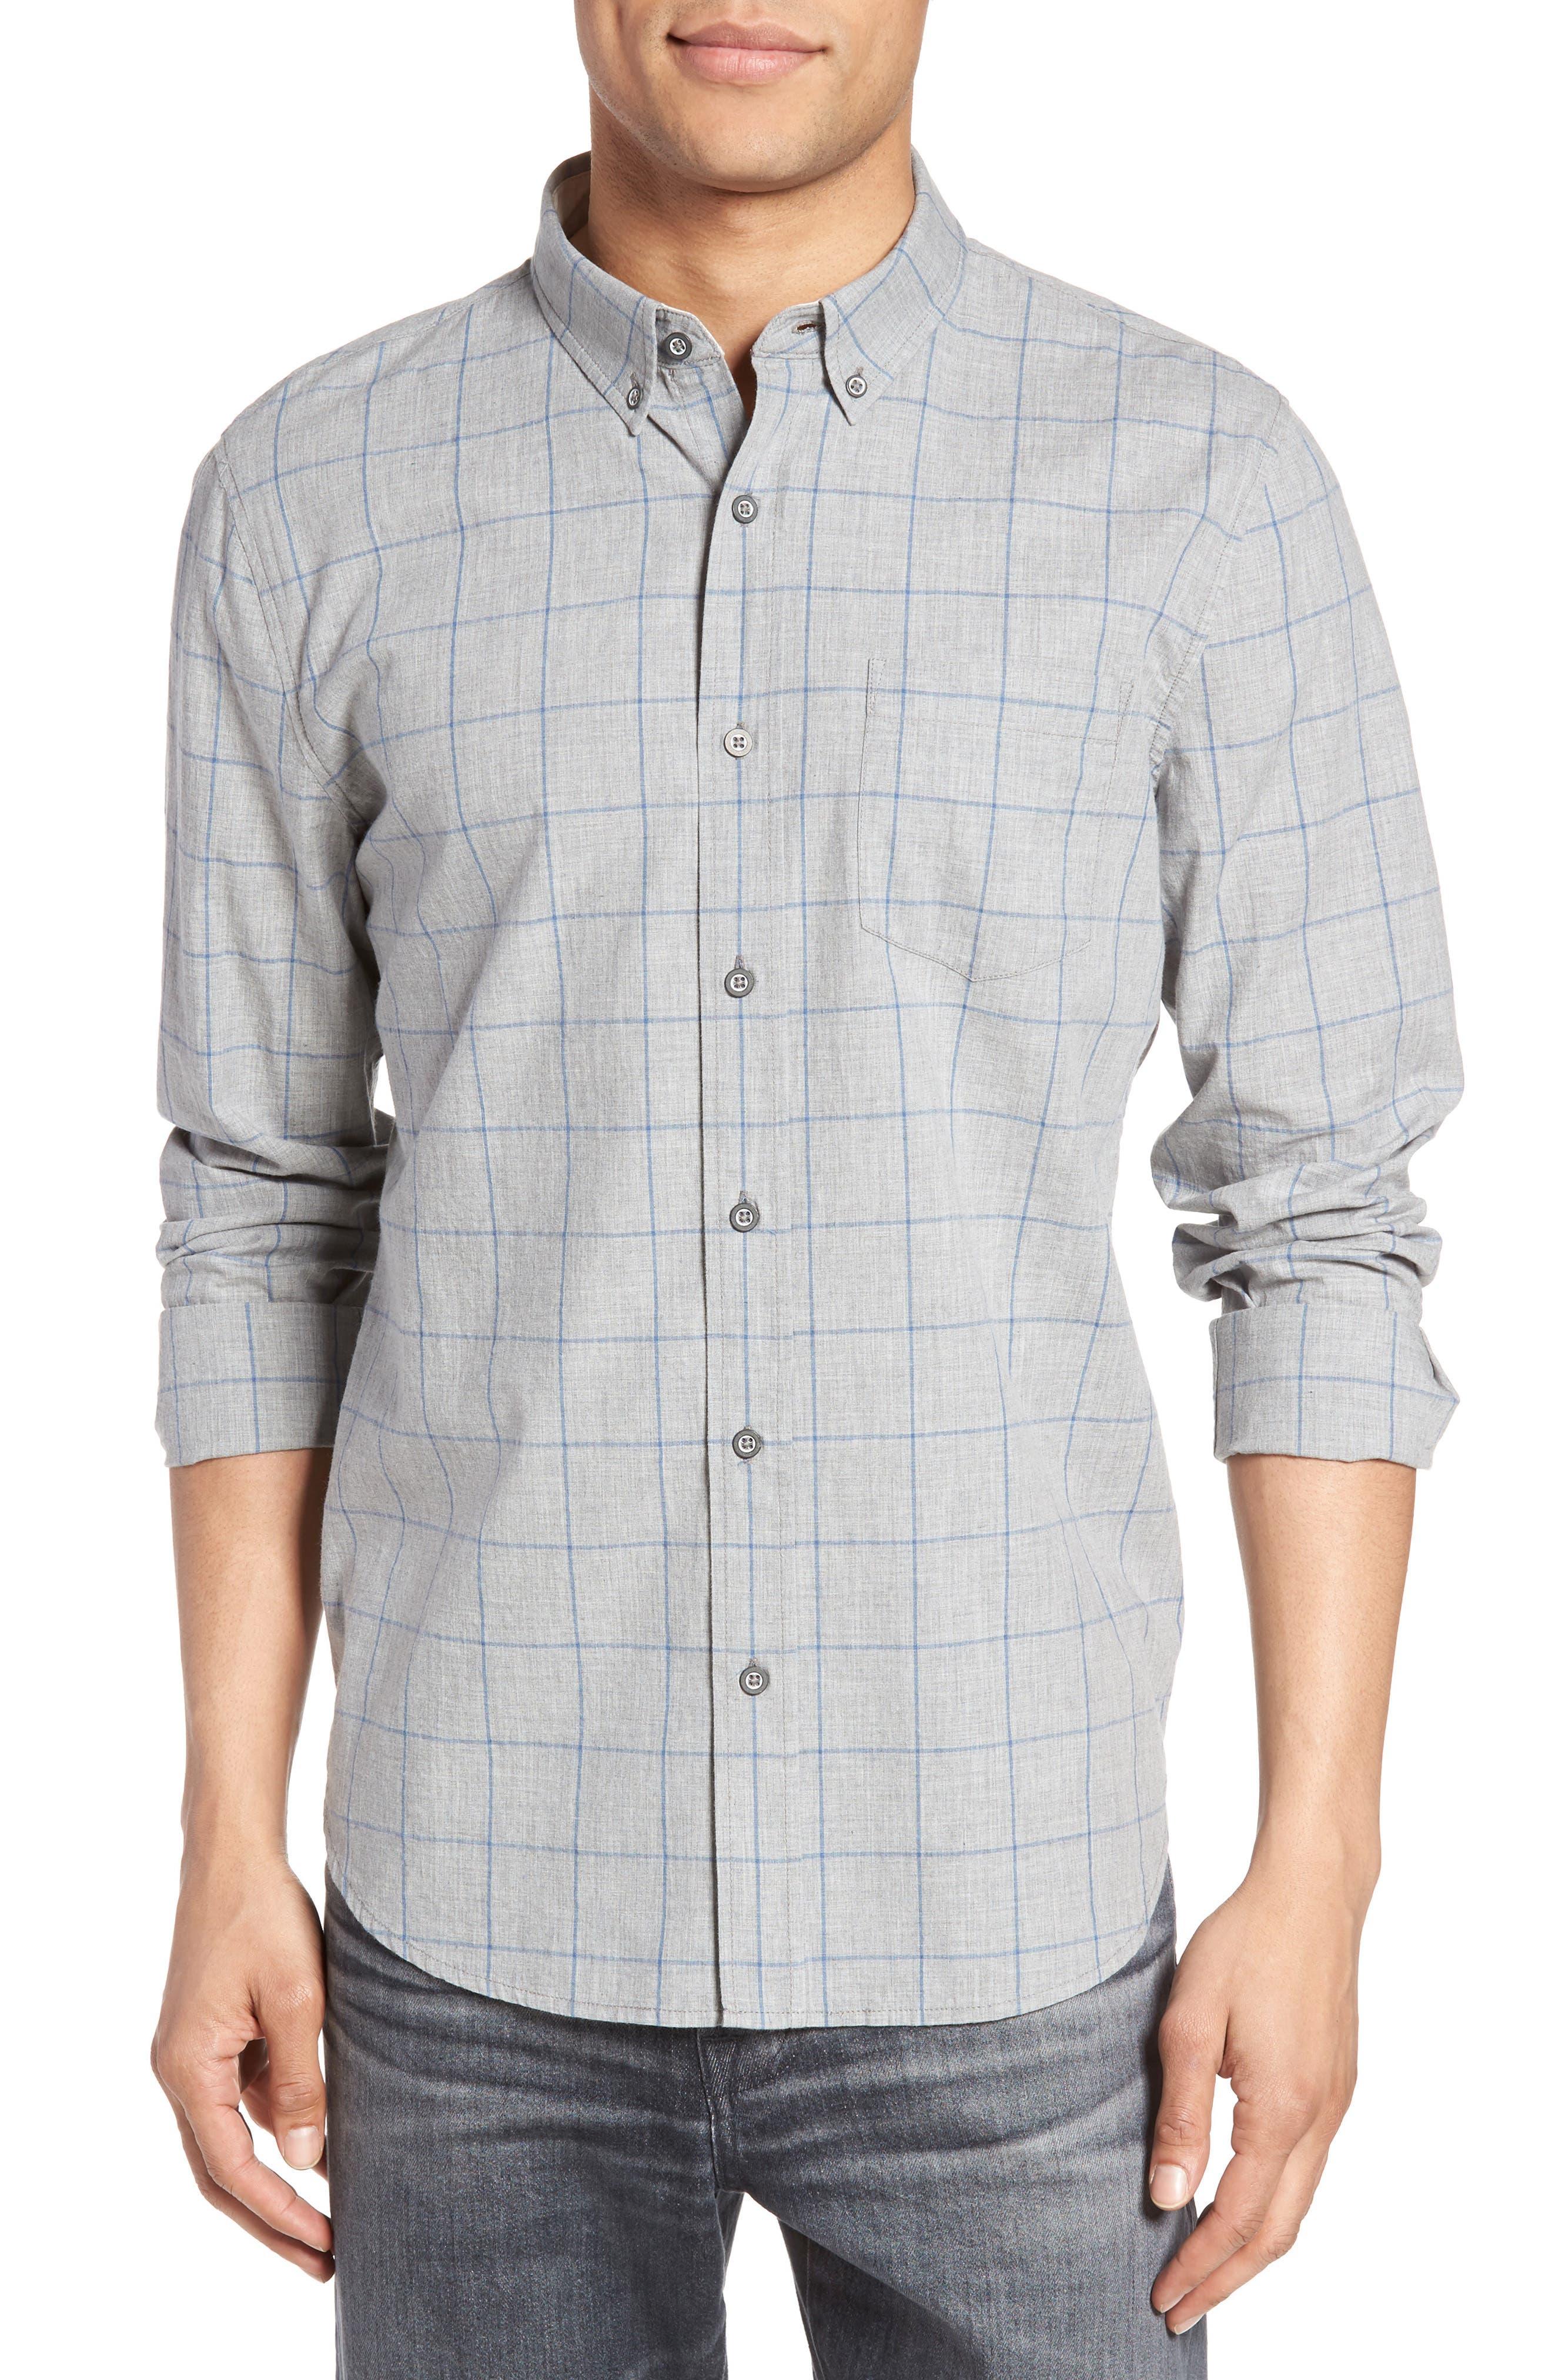 Grady Cotton Sport Shirt,                         Main,                         color, Heather Grey/ Sailor Blue